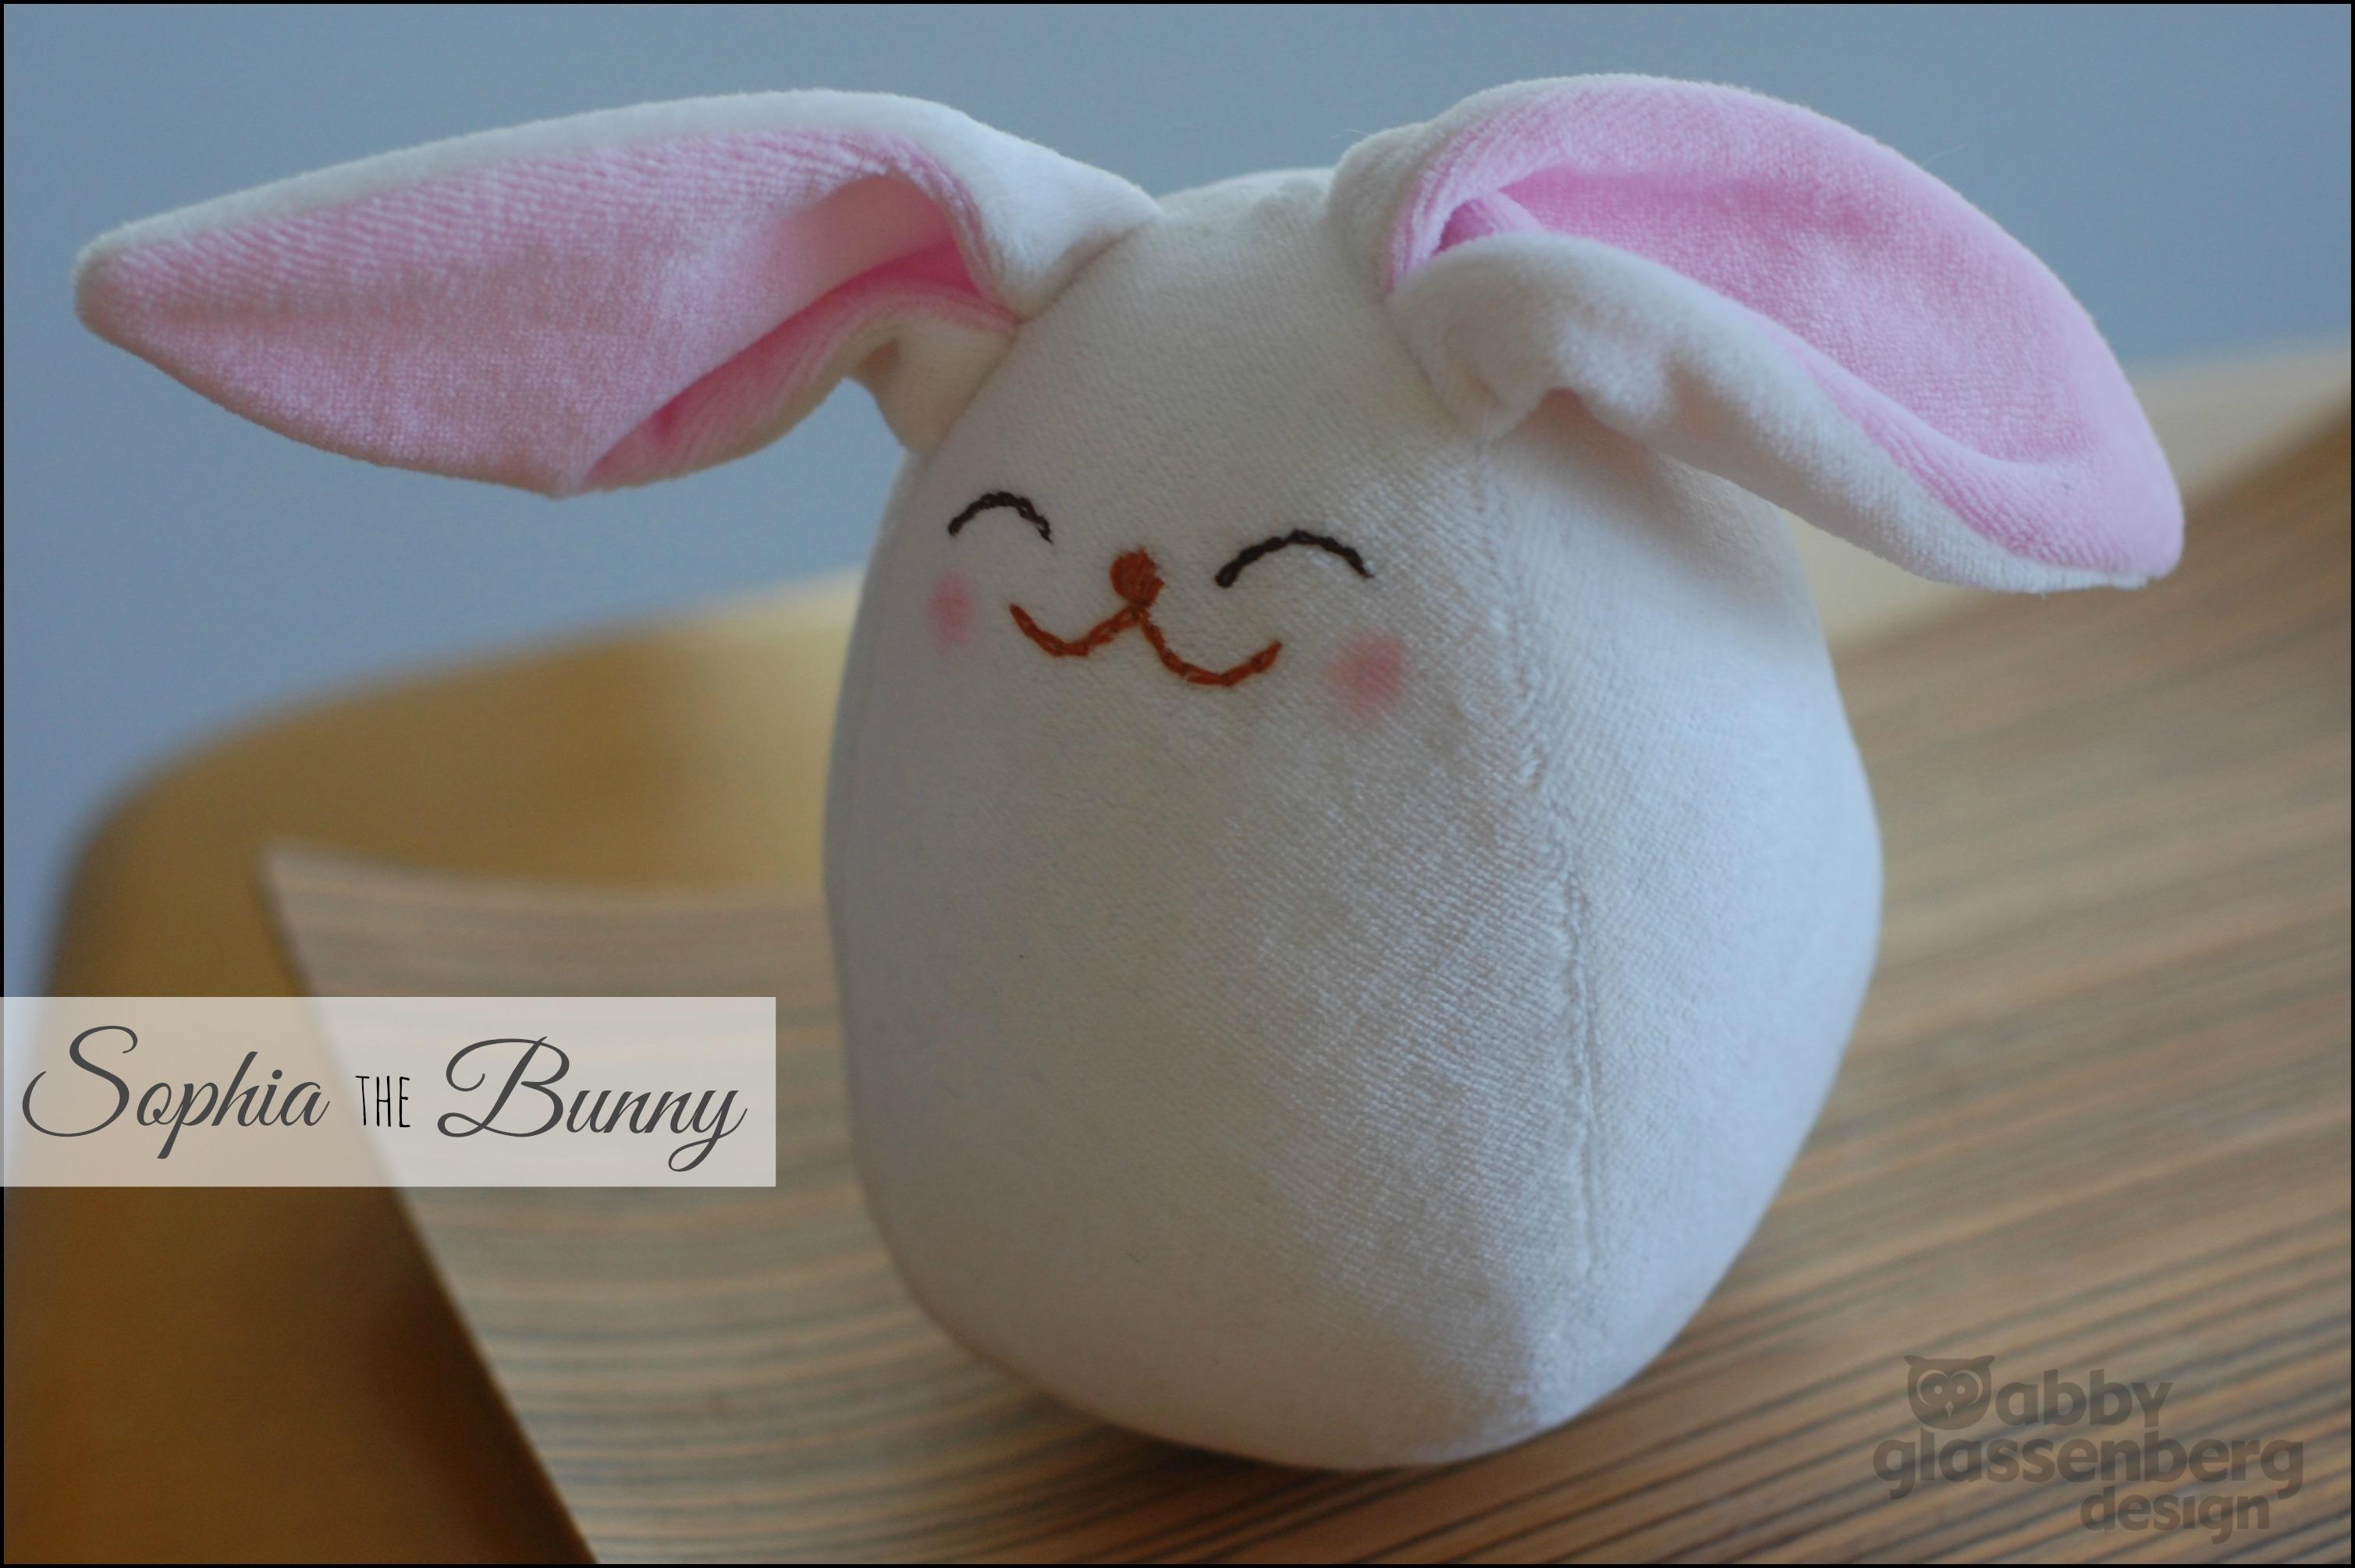 Free Pattern: Sophia the Bunny